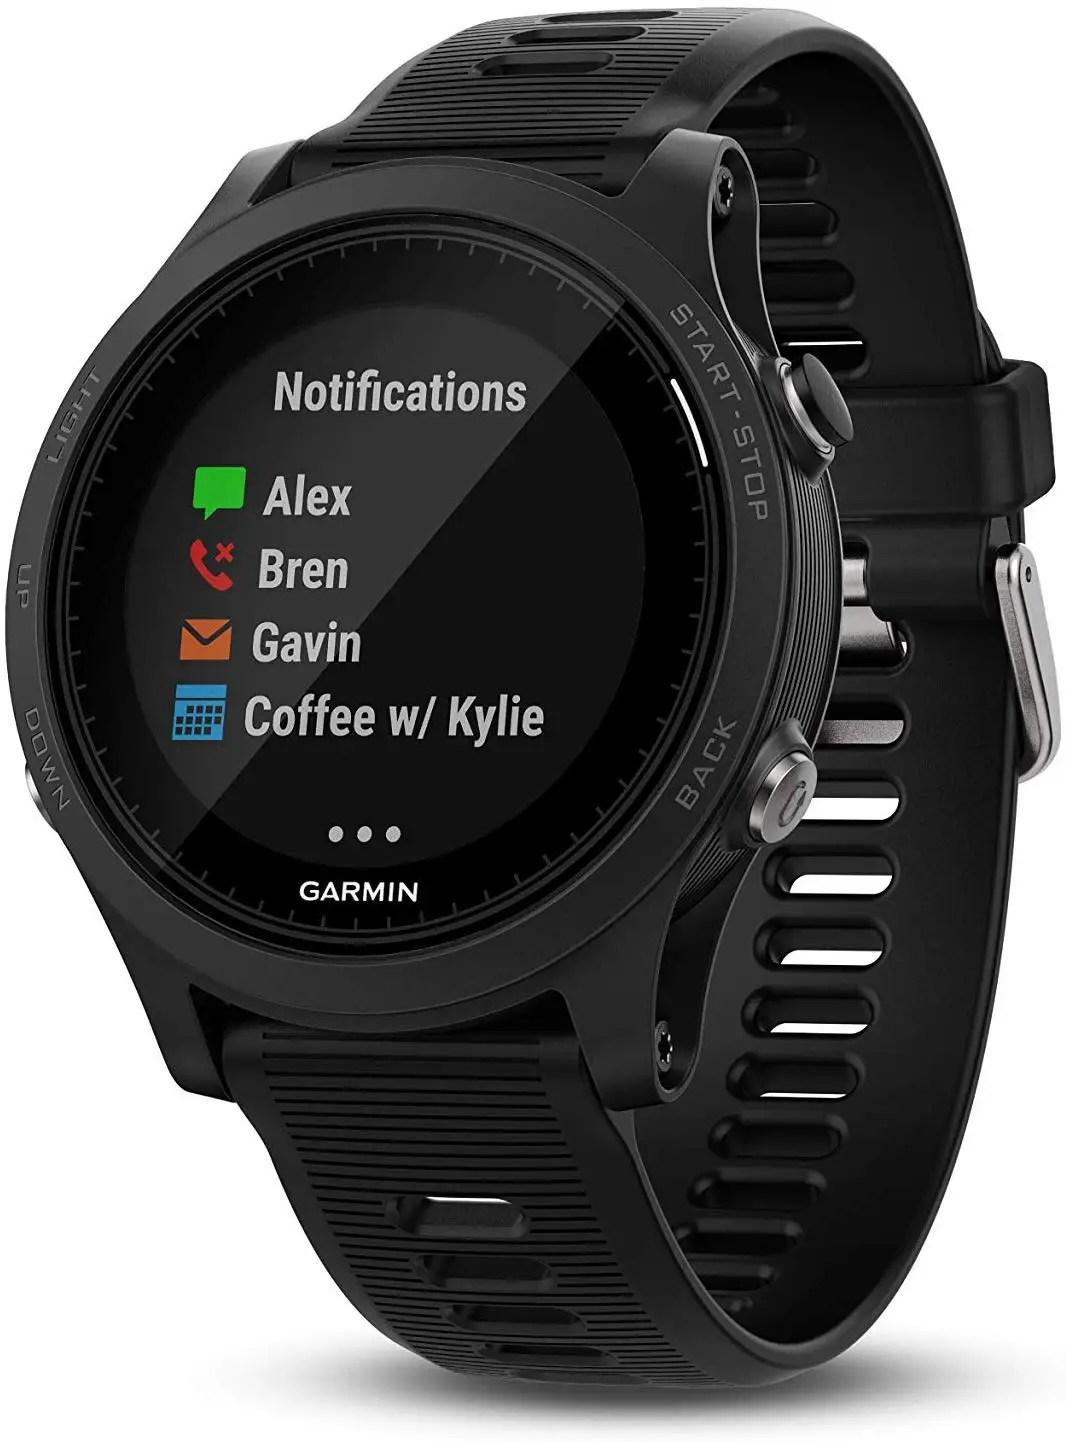 Garmin Forerunner 935 Specifications,精選,測心跳運動手表更是炙手可熱的商品,團購,還有可以聽音樂運動手表,穿戴類別,像GPS運動手錶,像GPS運動手錶,還有可以聽音樂運動手表,推薦, 在momo購物中心買,並透過社群網站分享。請在桌上型電腦登入 Garmin Connect, Features and Price